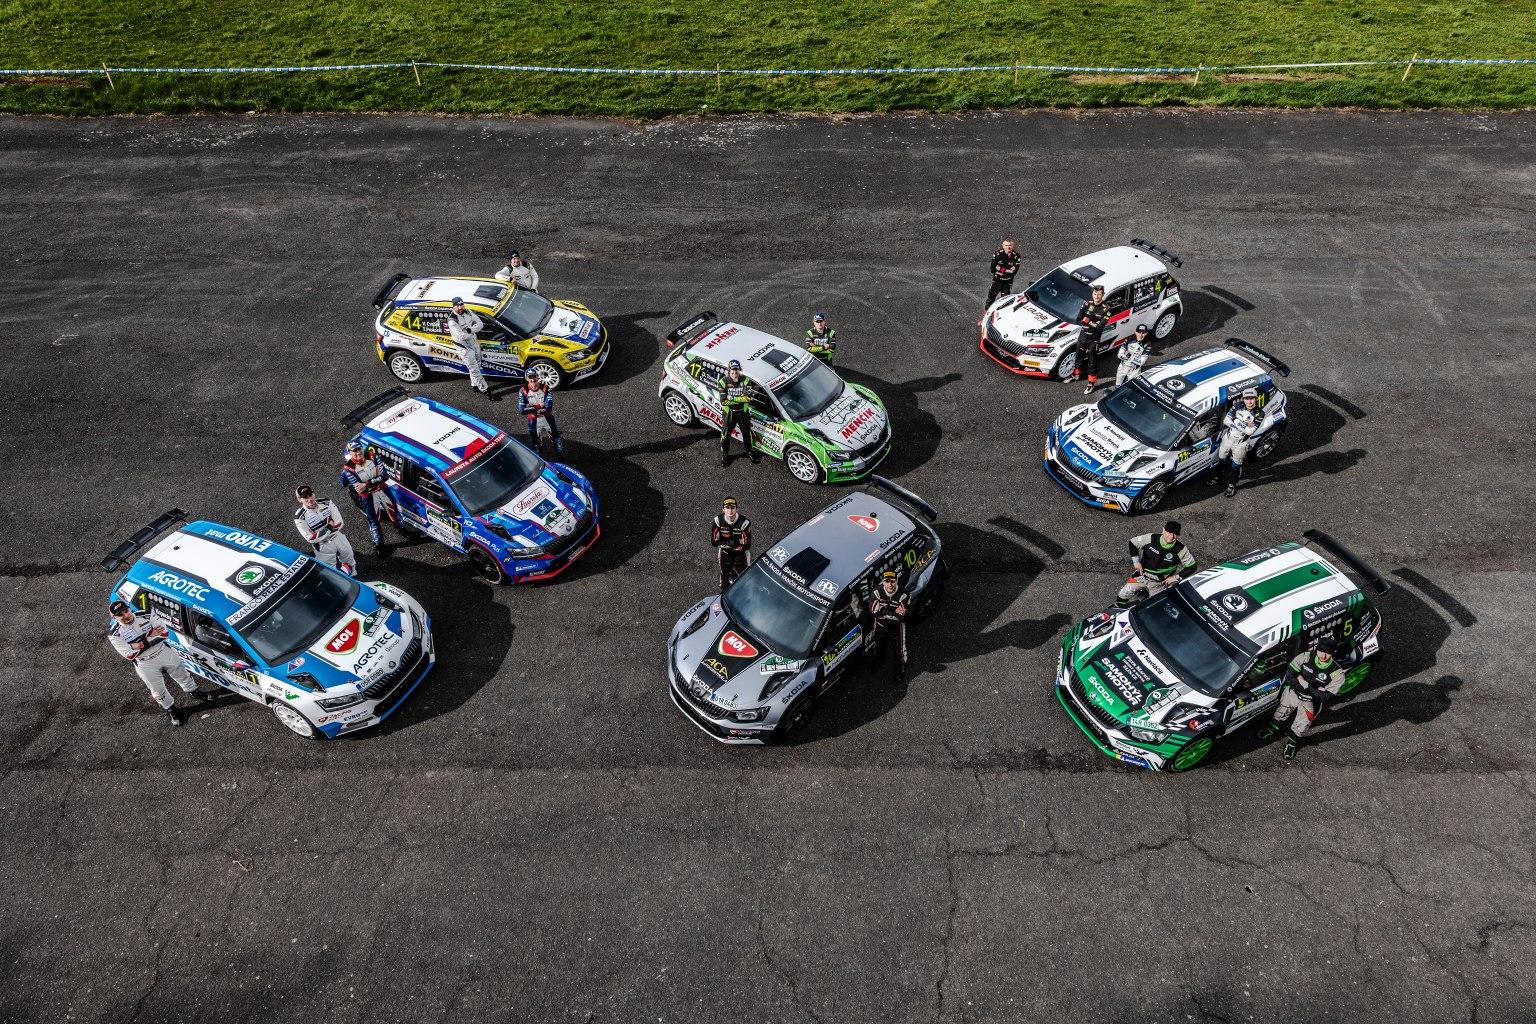 Rallye-Sumava-Klatovy-2021_SKODA-dealerske-tymy-pro-MCR-2021-motorsport